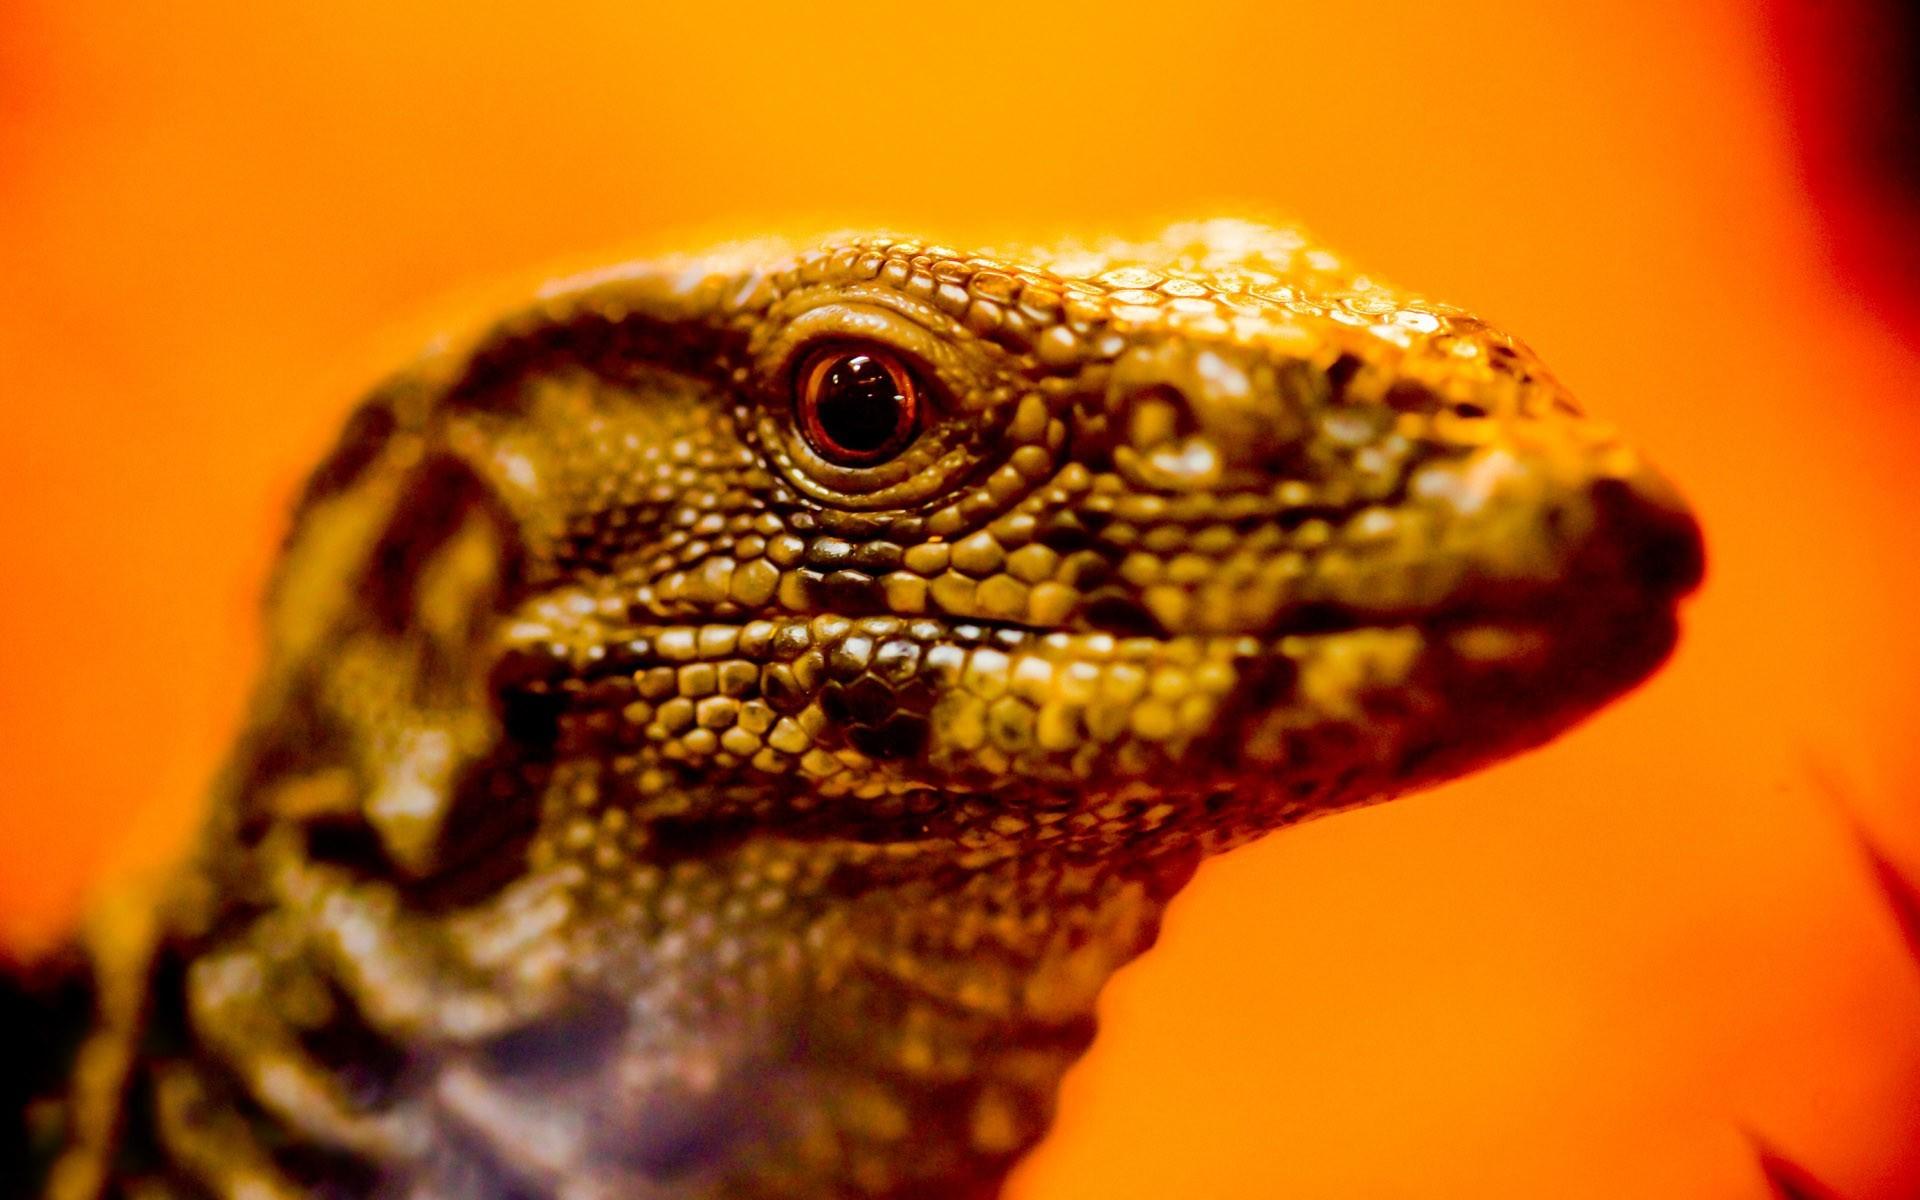 pics of lizards